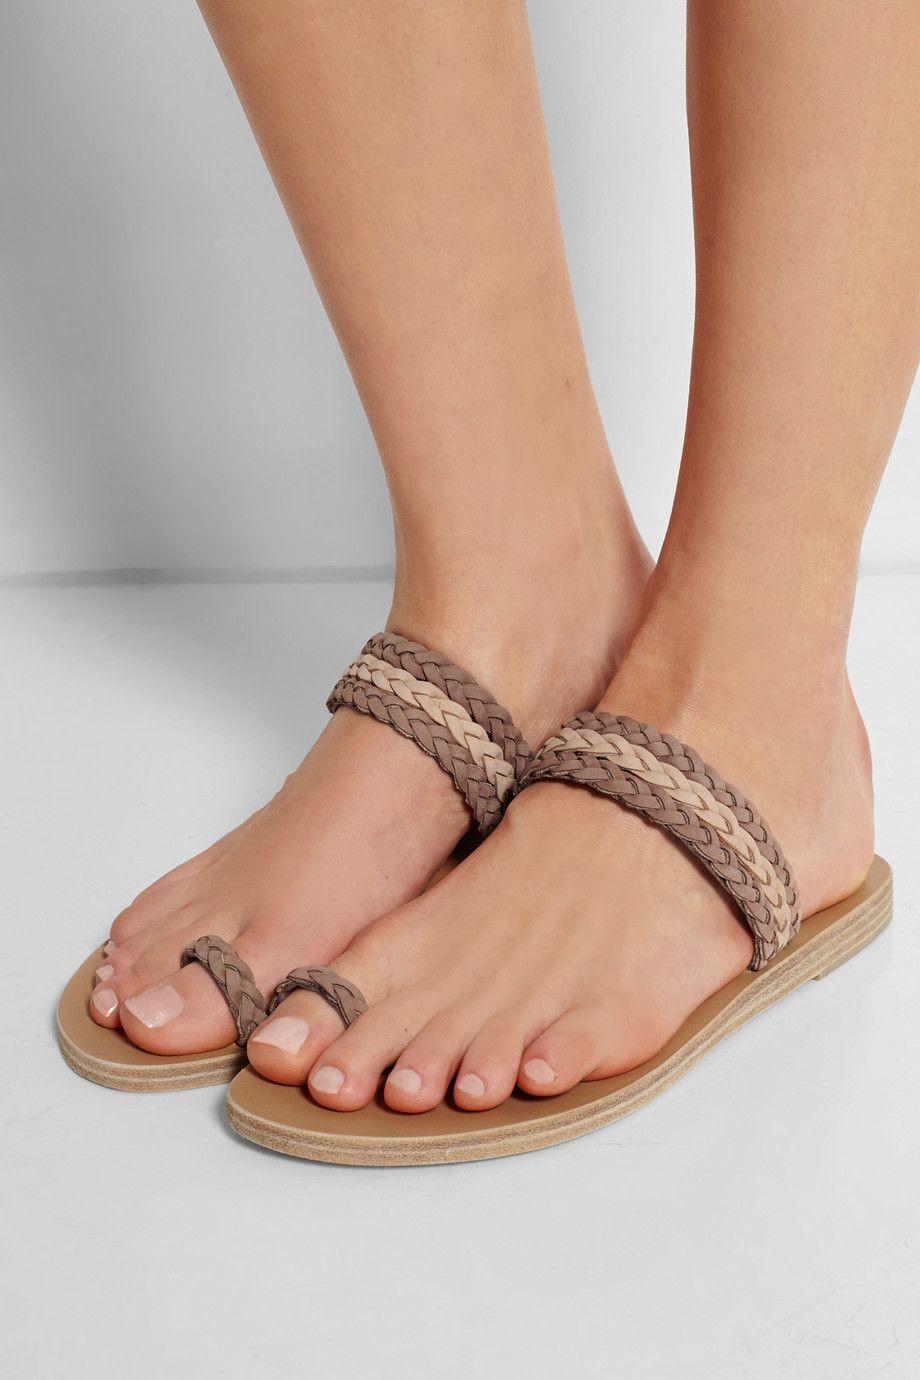 FOOTWEAR - Toe post sandals Valia Gabriel Gif8o5q